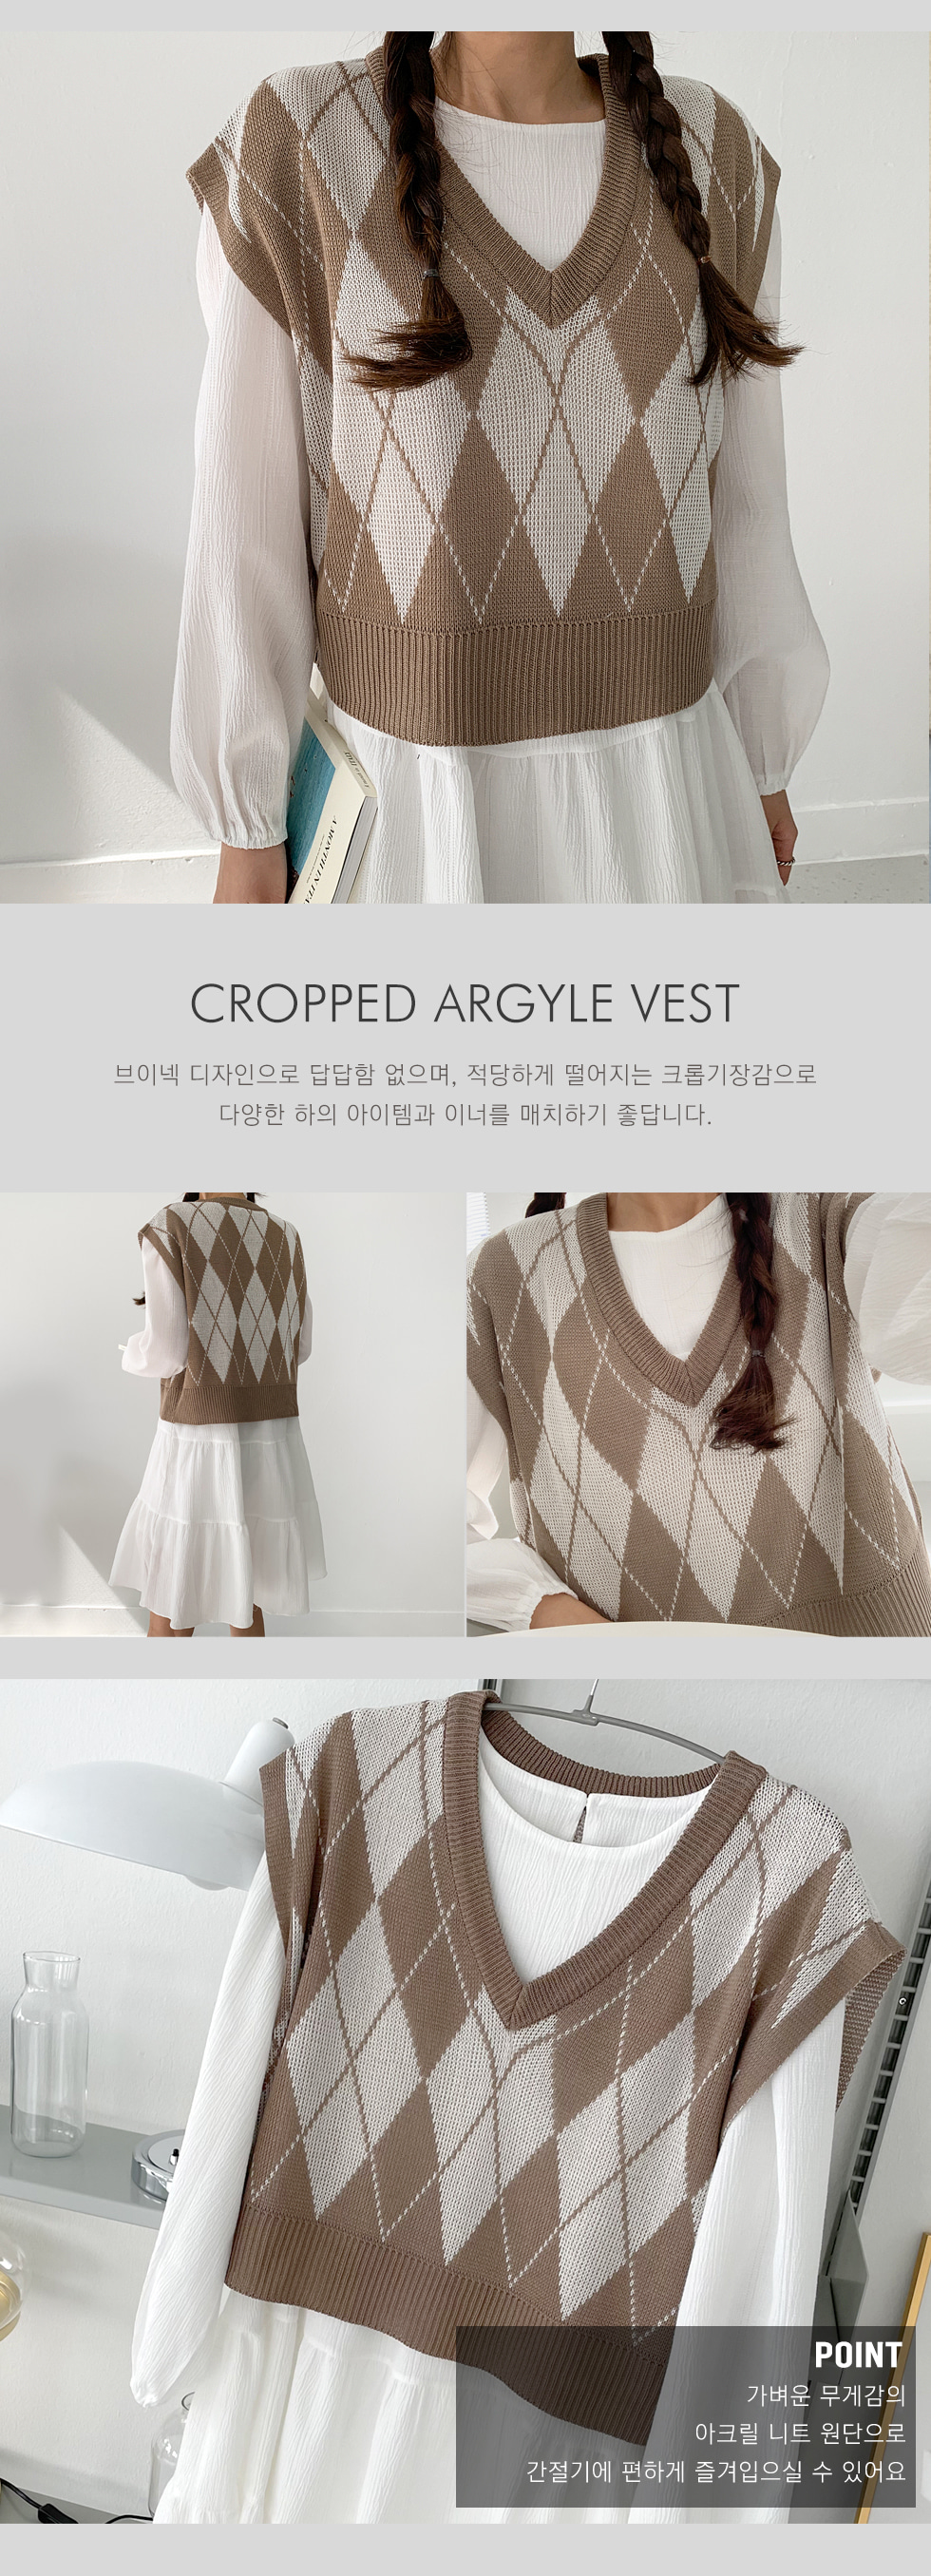 Cropped Argyle Knitwear Vest